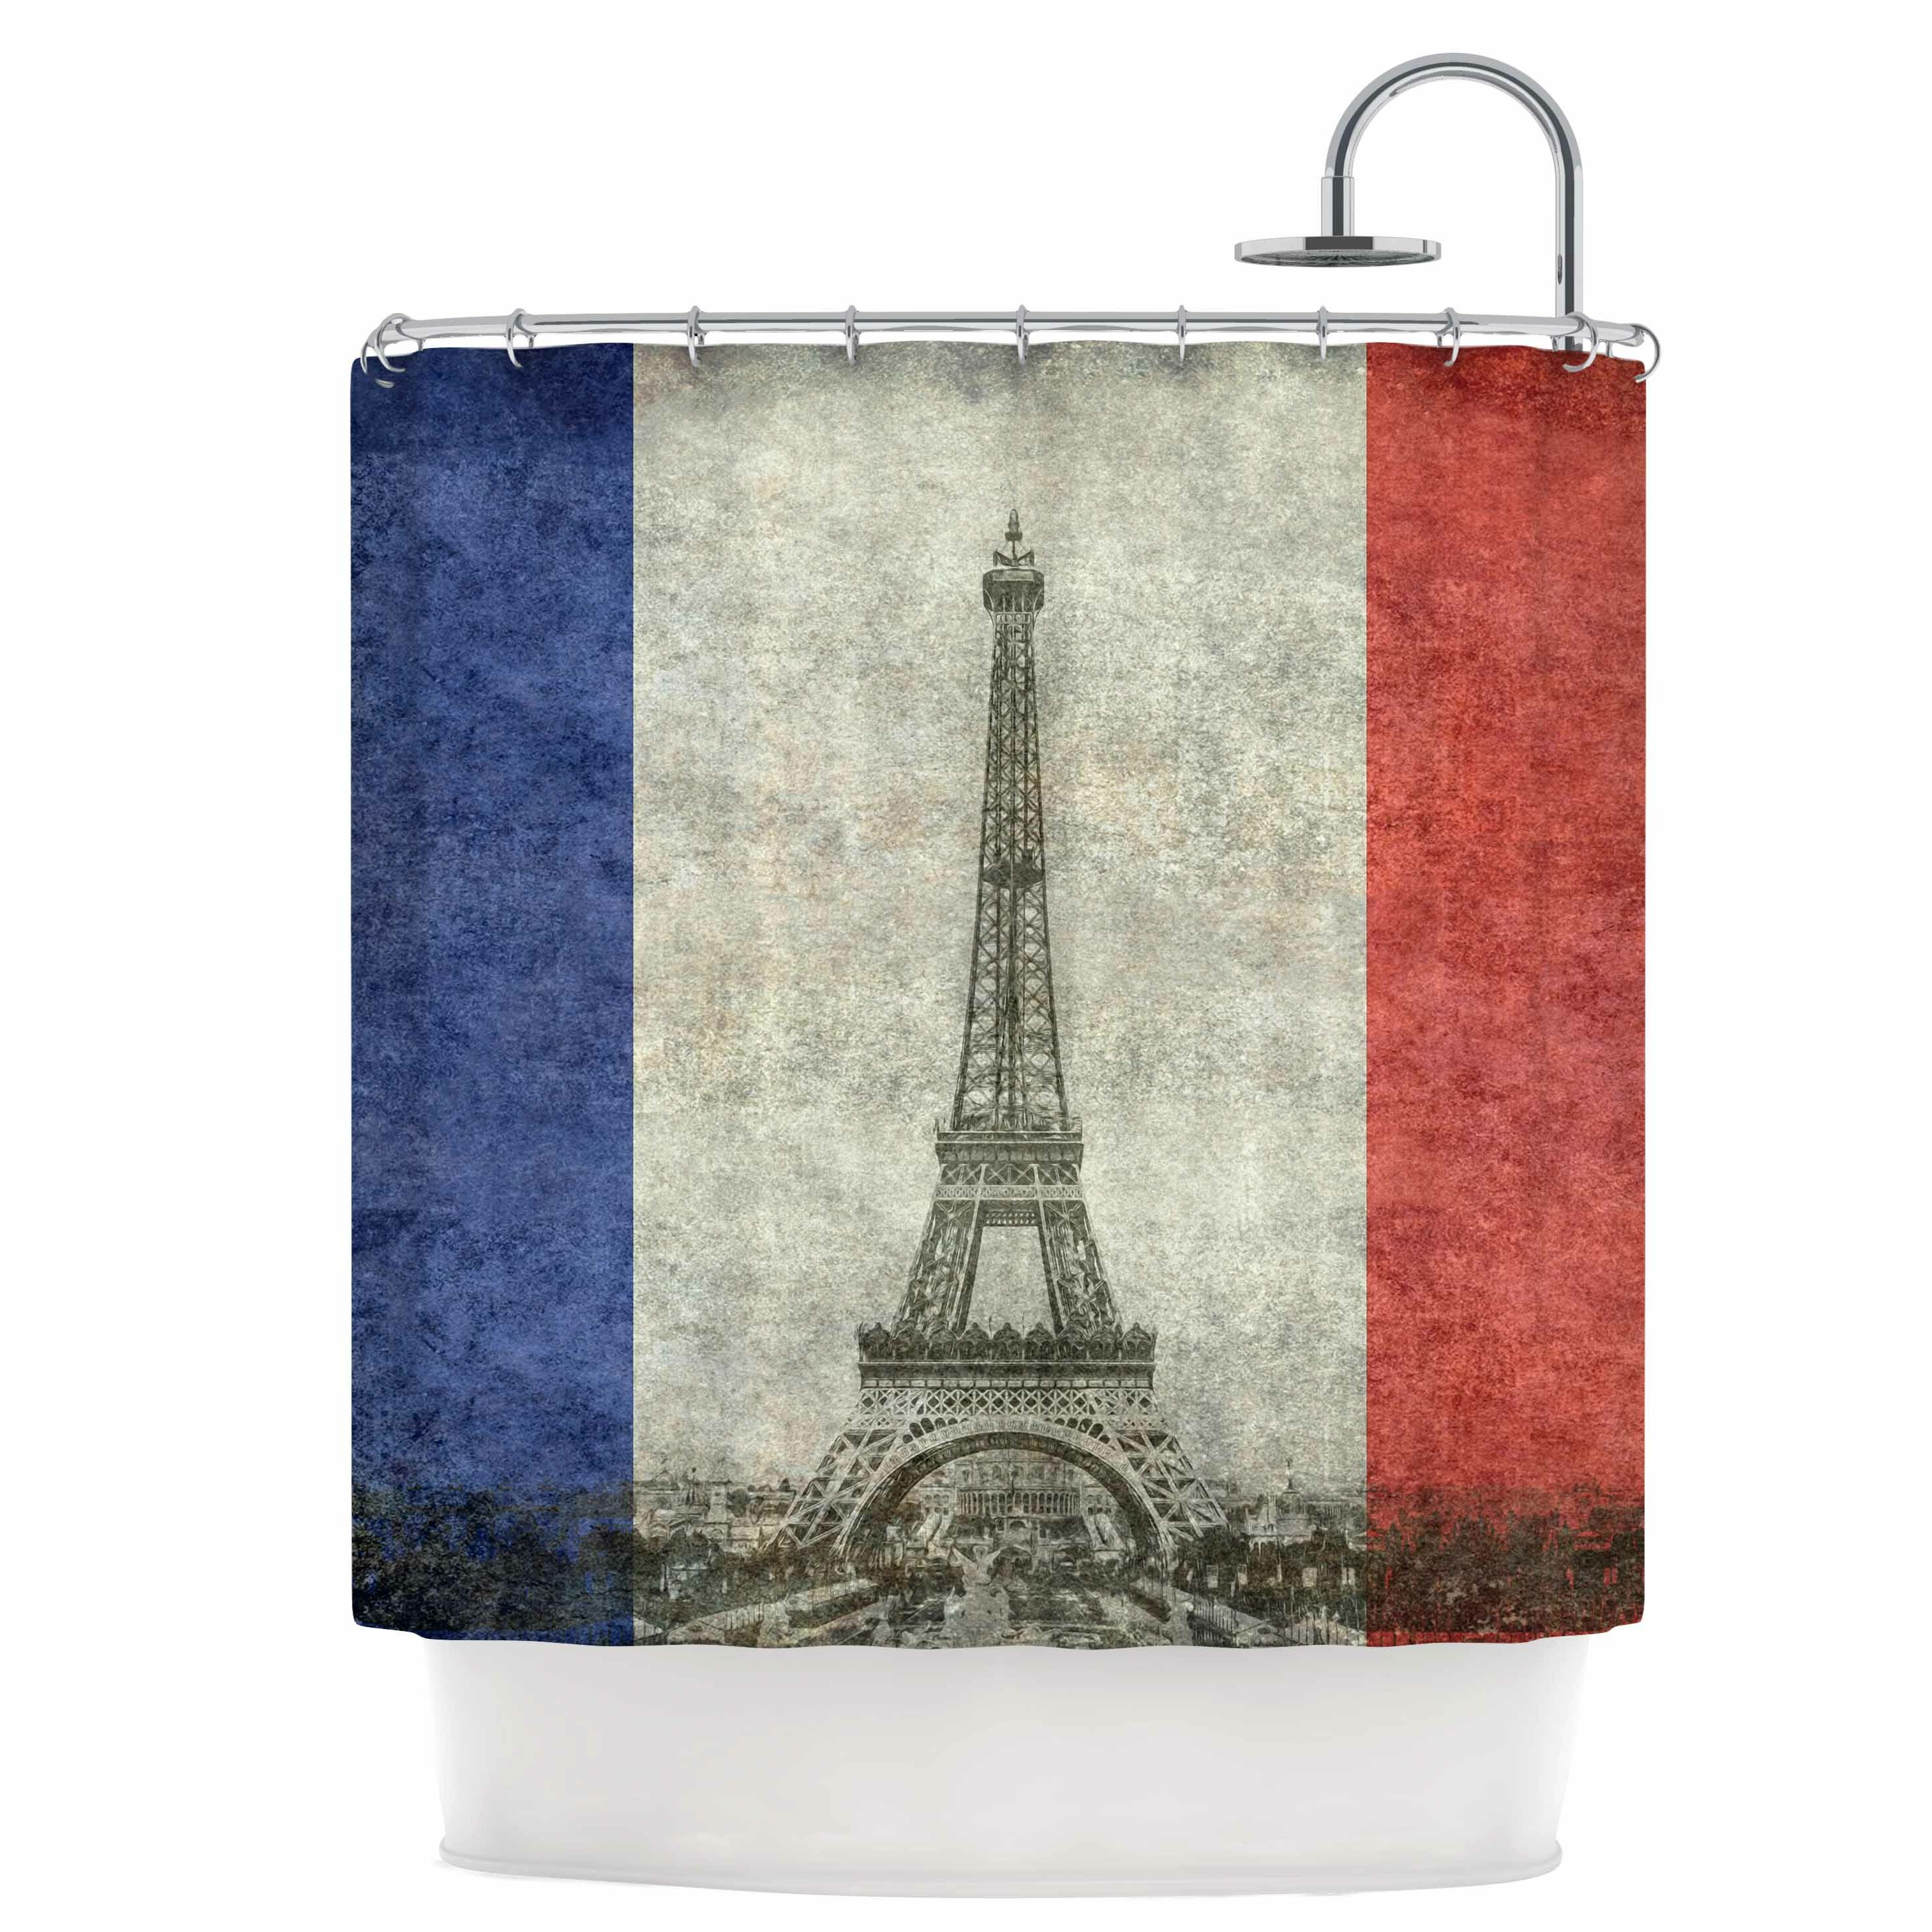 Vintage Paris Shower Curtain by KESS InHouse